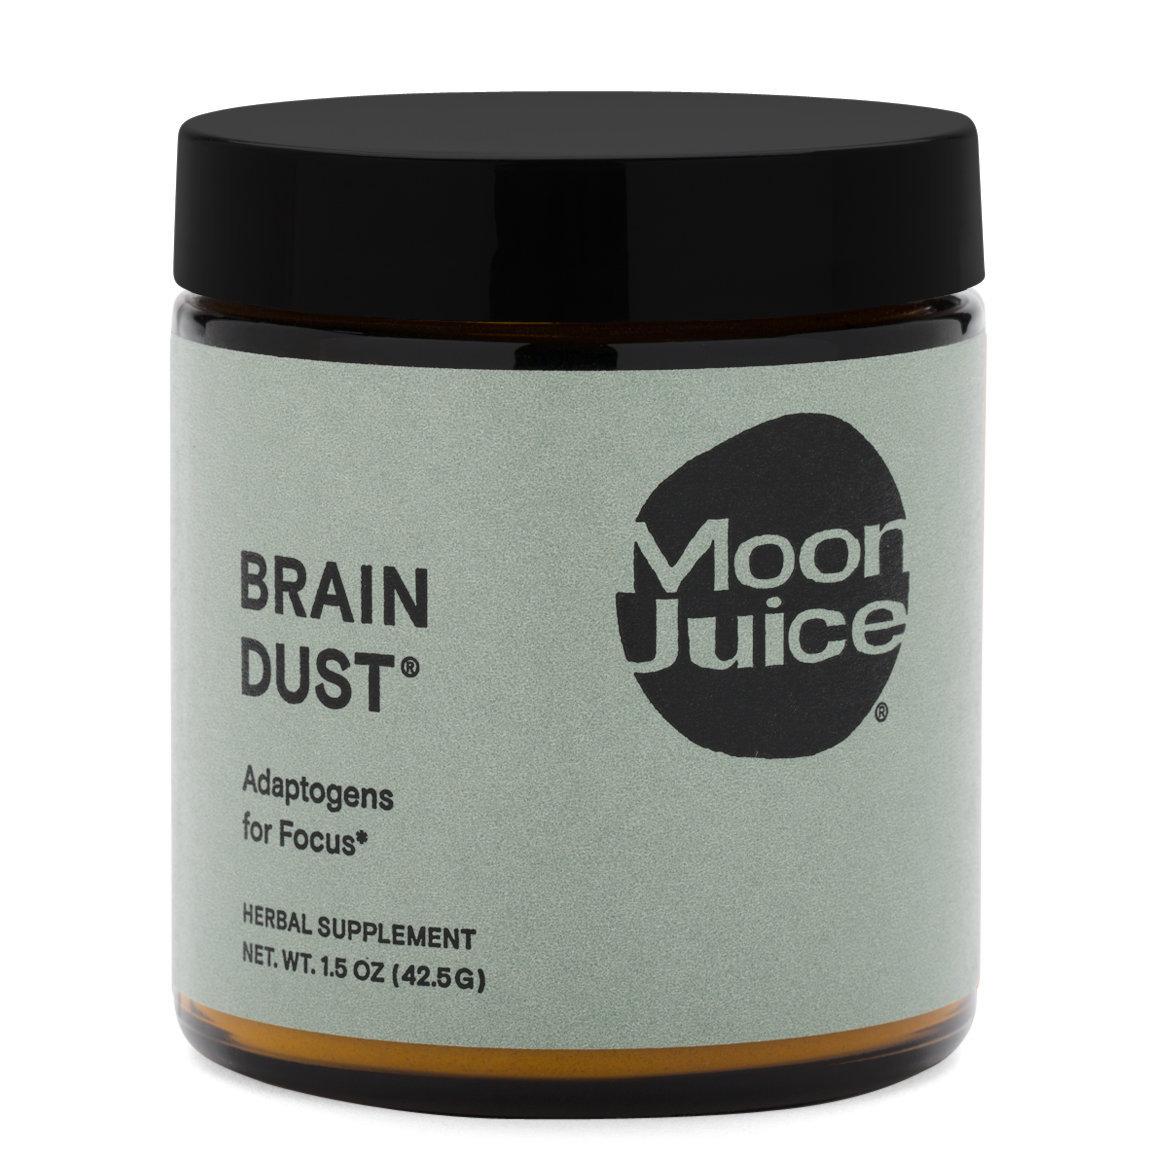 Moon Juice Brain Dust product swatch.